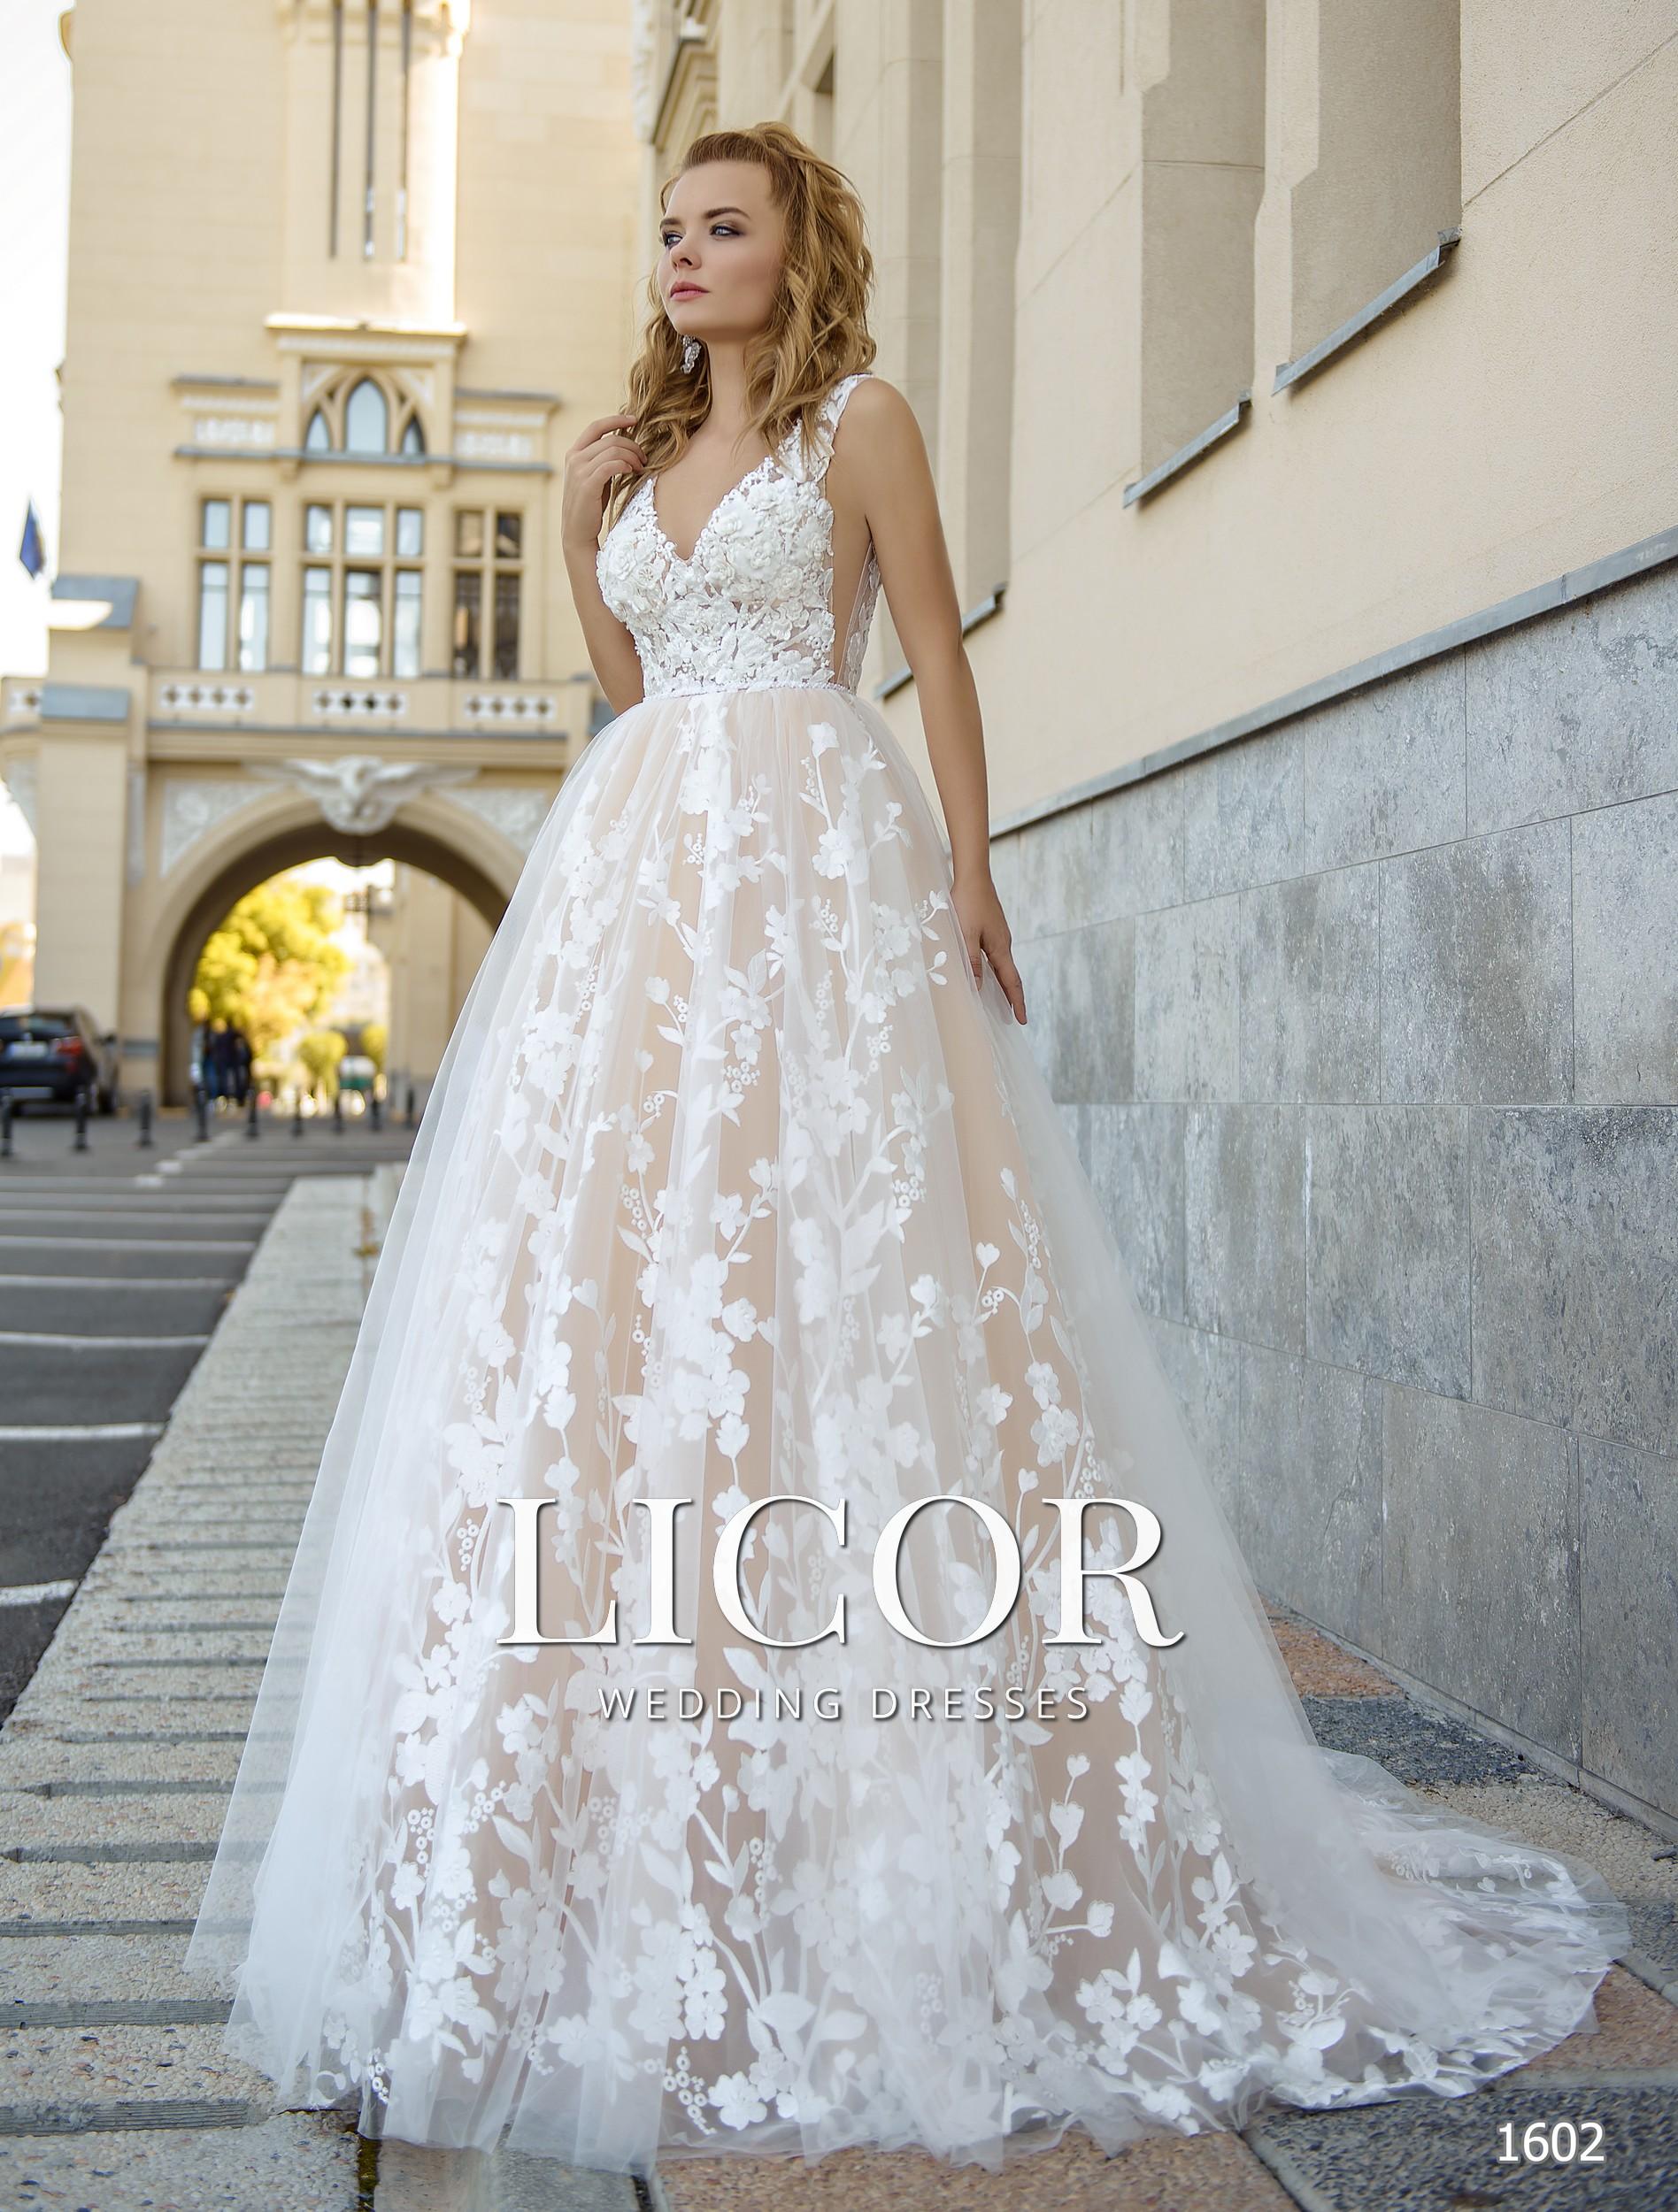 http://licor.com.ua/images/stories/virtuemart/product/1602(1).jpg